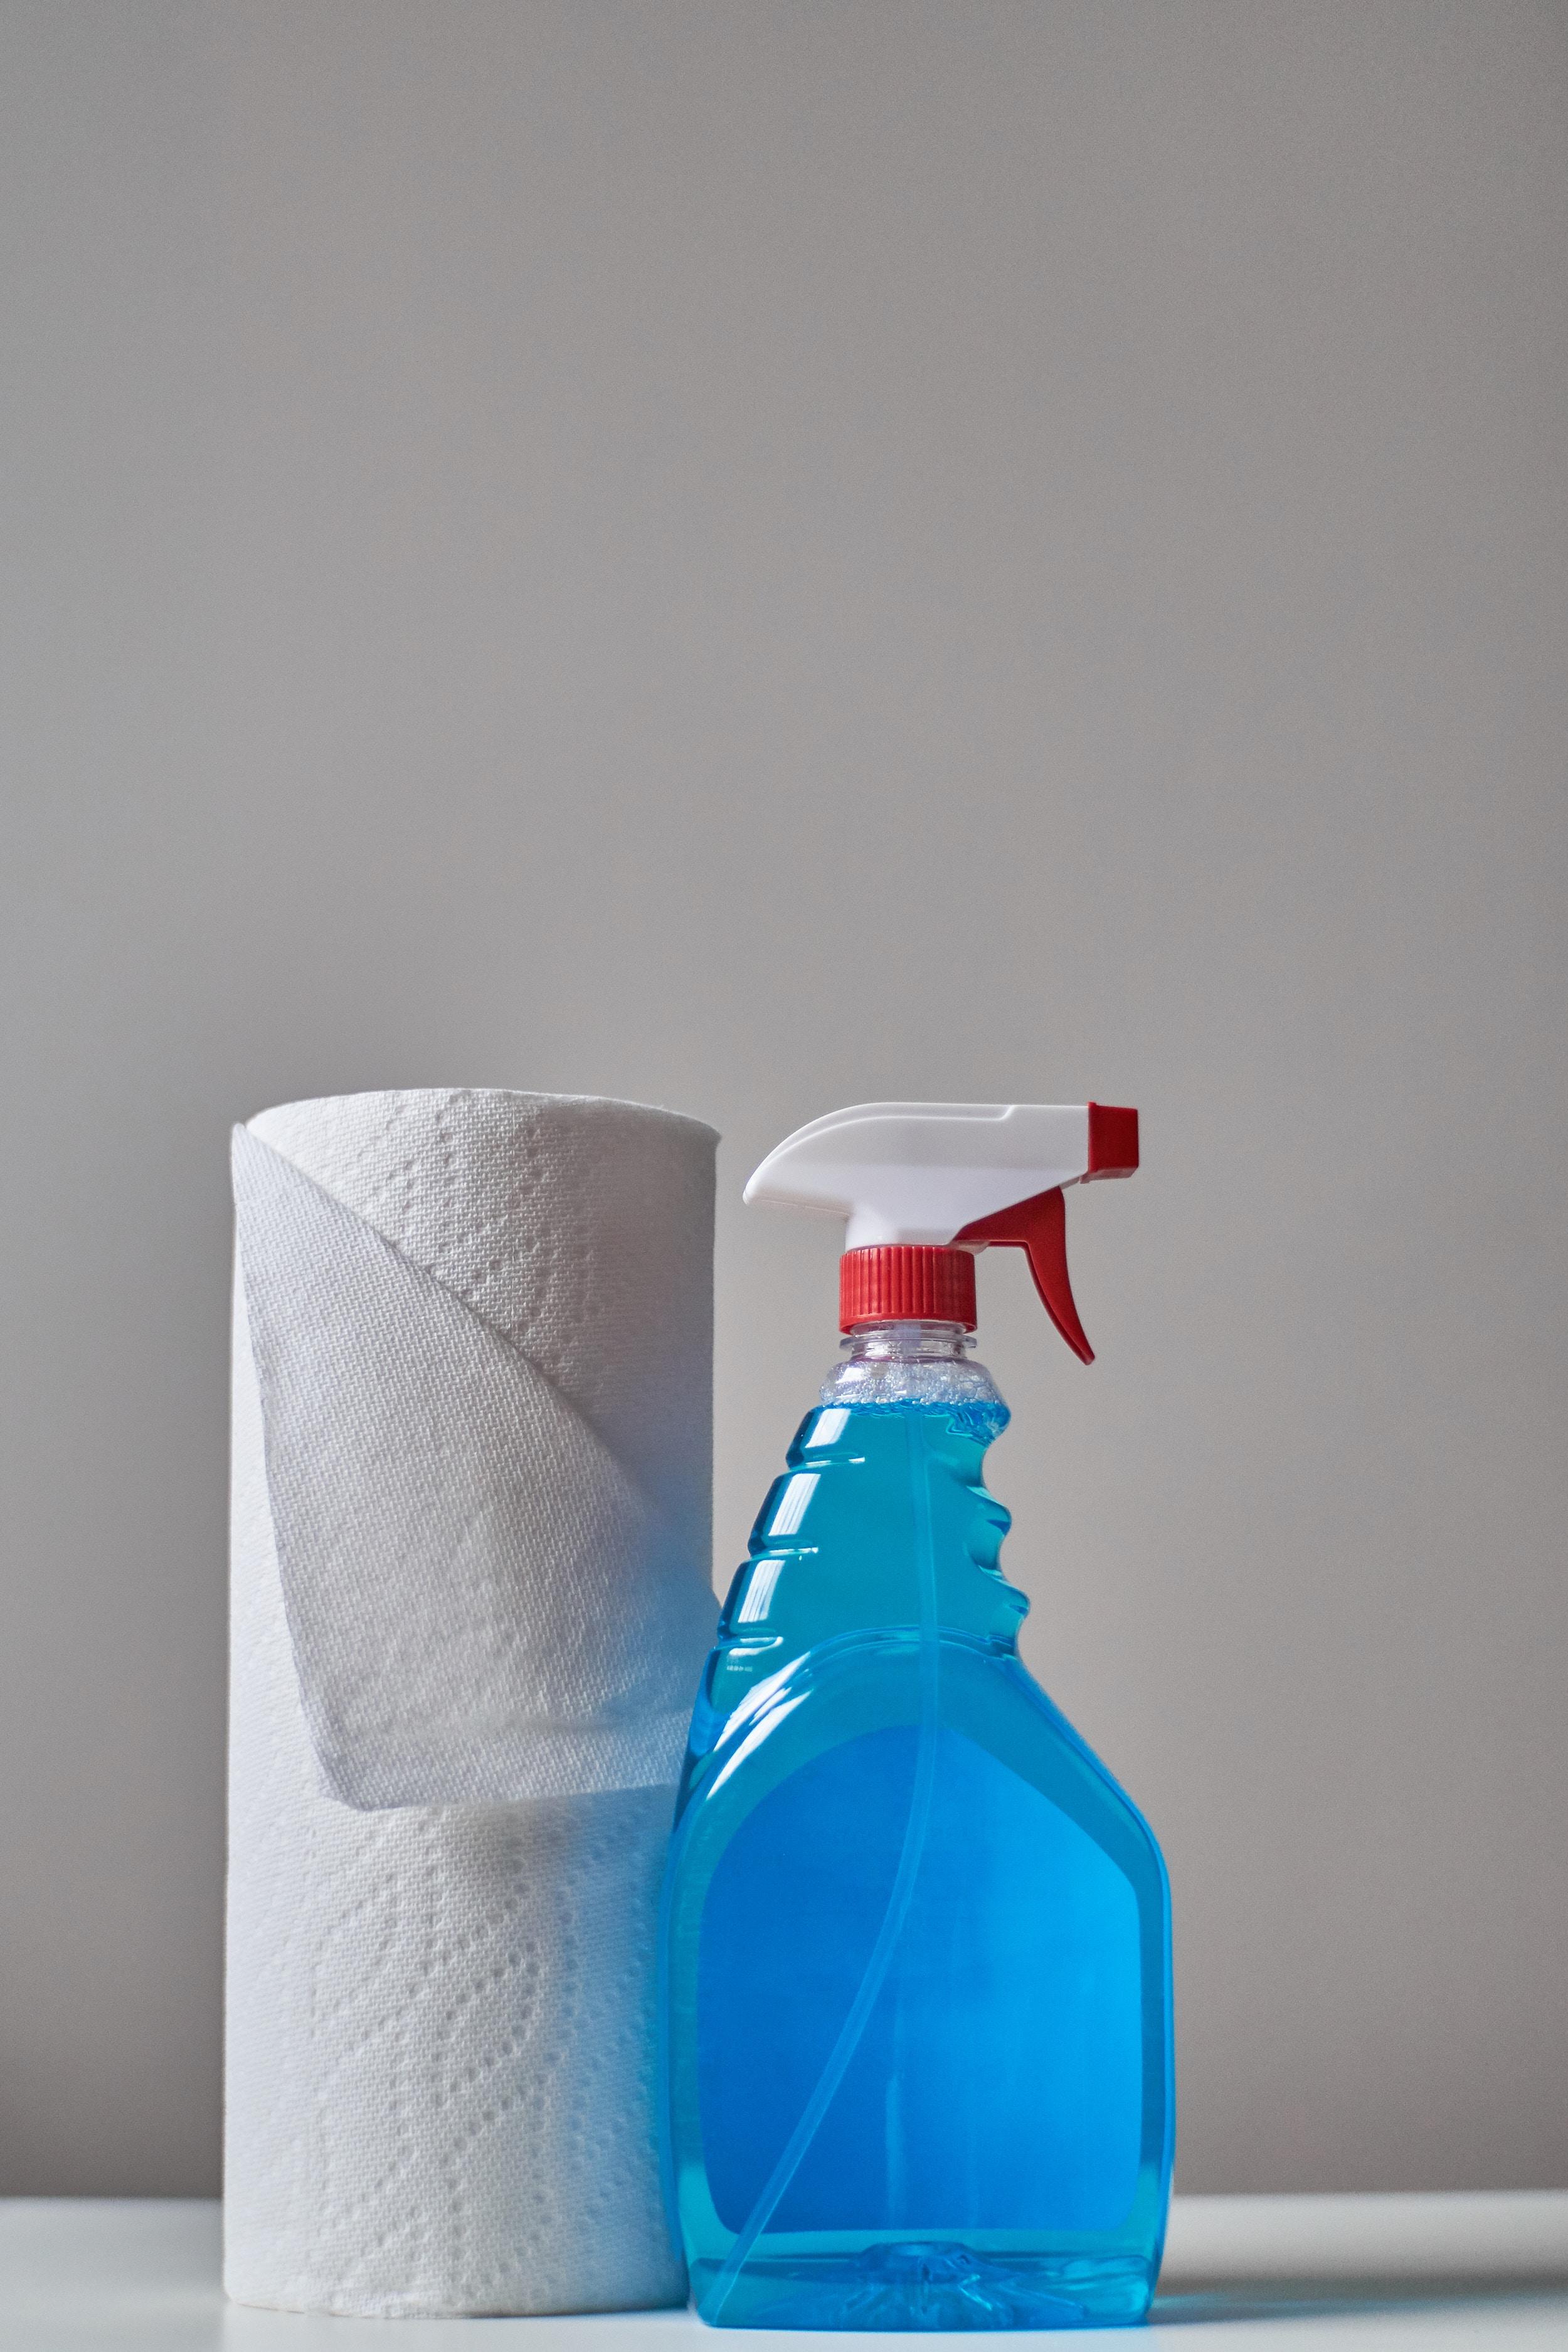 Fabricar o próprio produto de limpeza